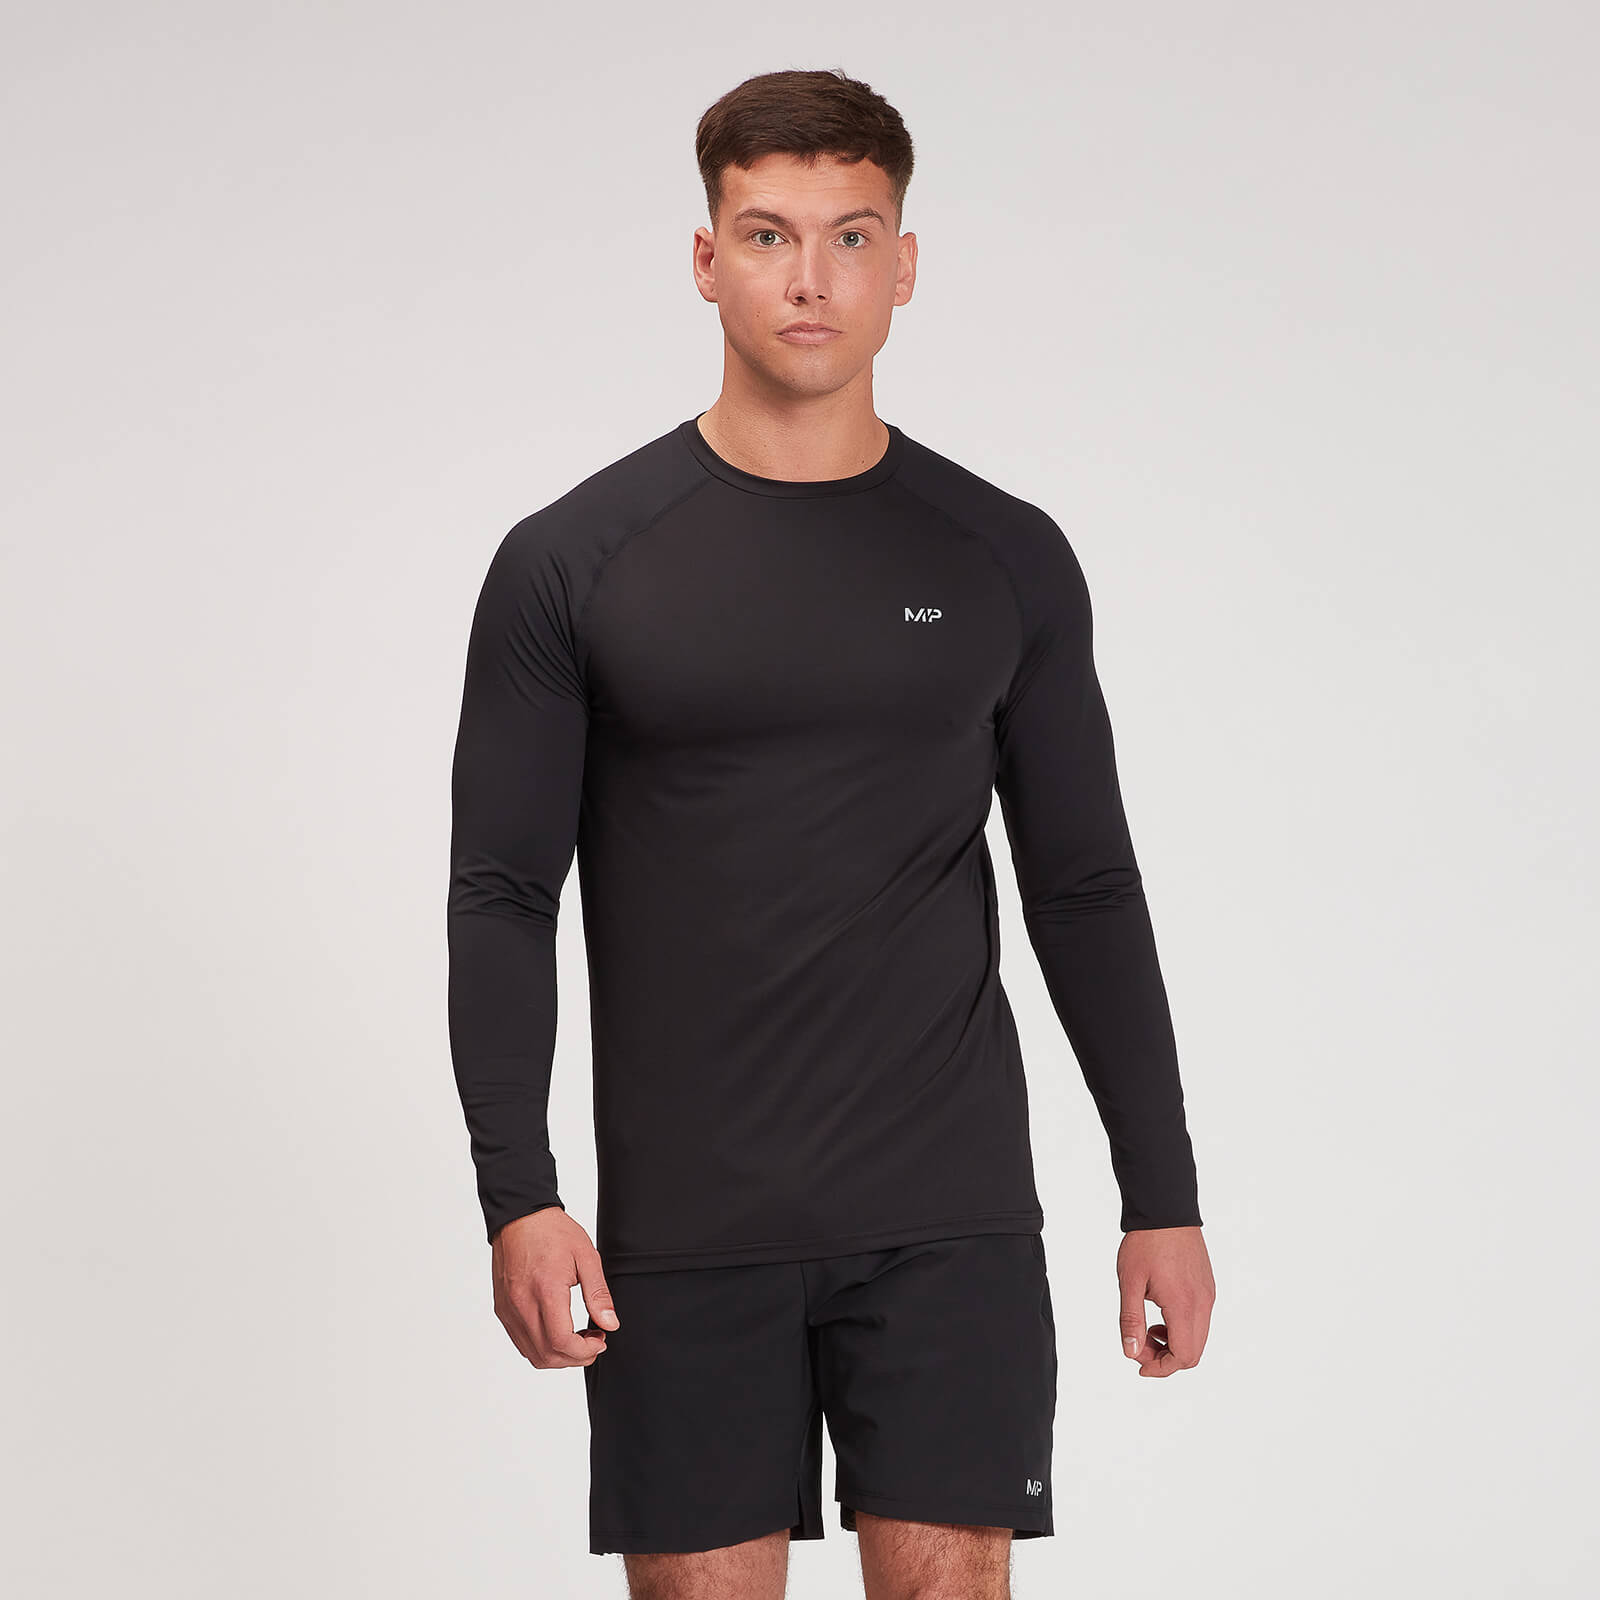 Купить MP Men's Velocity Long Sleeve Top - Black - XXL, Myprotein International